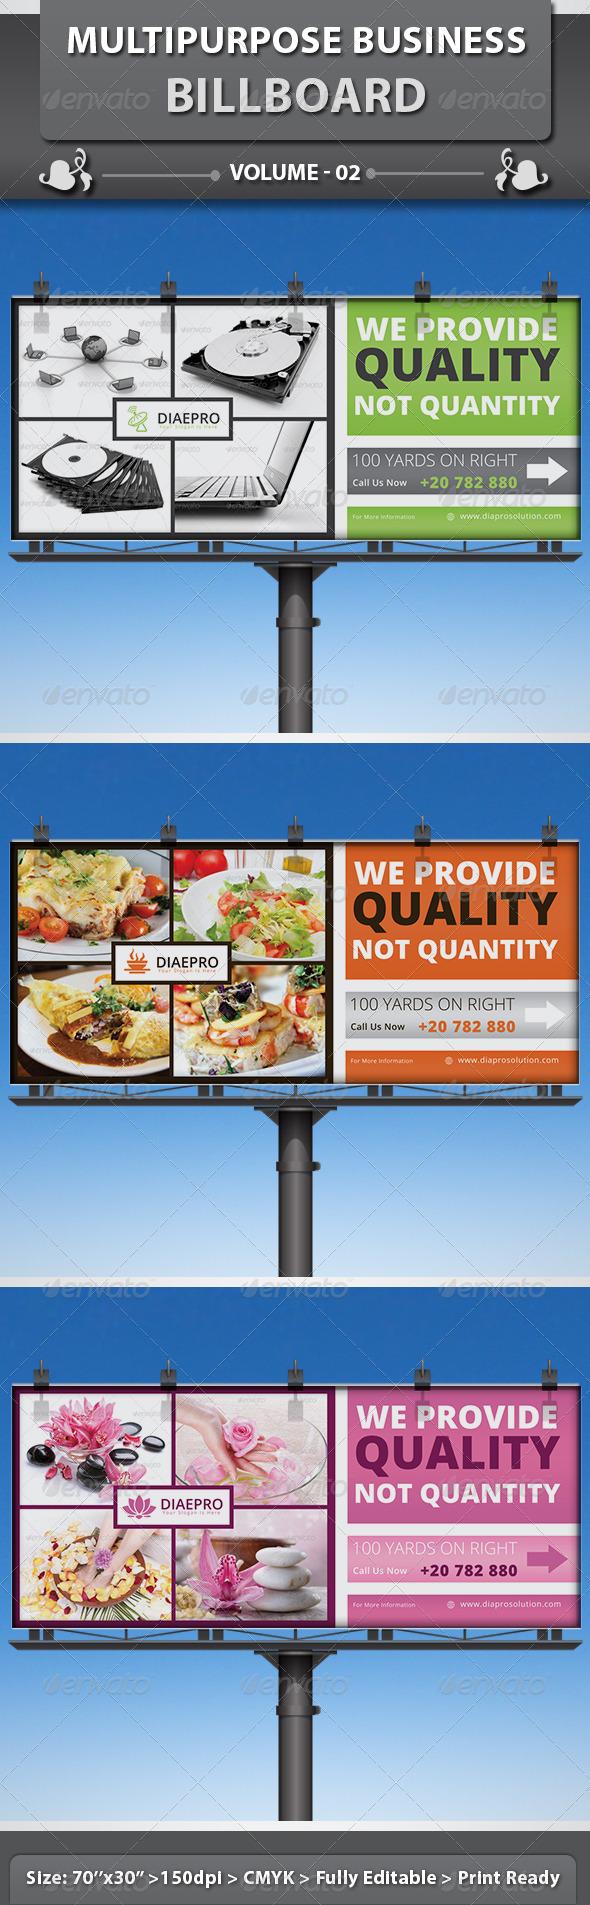 Multipurpose Business Billboard | Volume 2 - Signage Print Templates